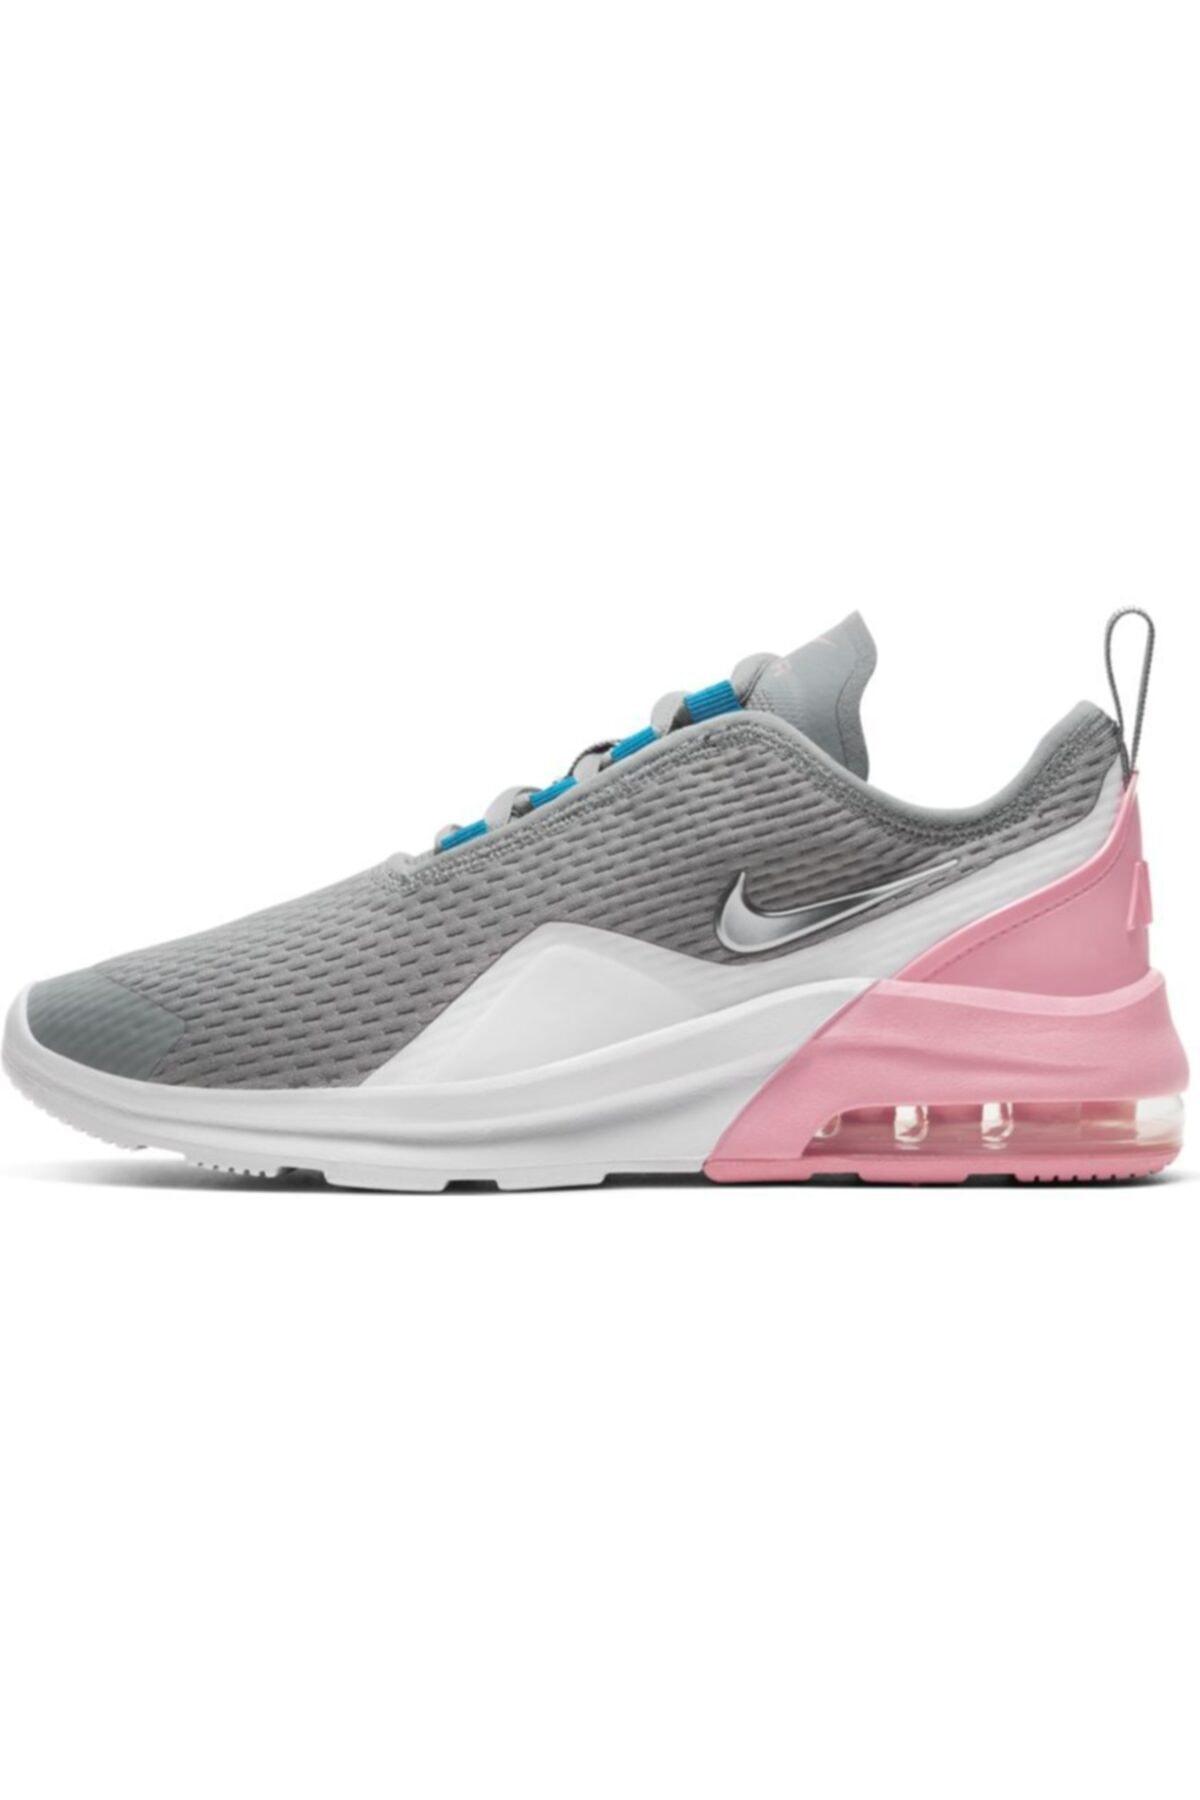 Nike Air Max Motion 2 Kadın Ayakkabı 2